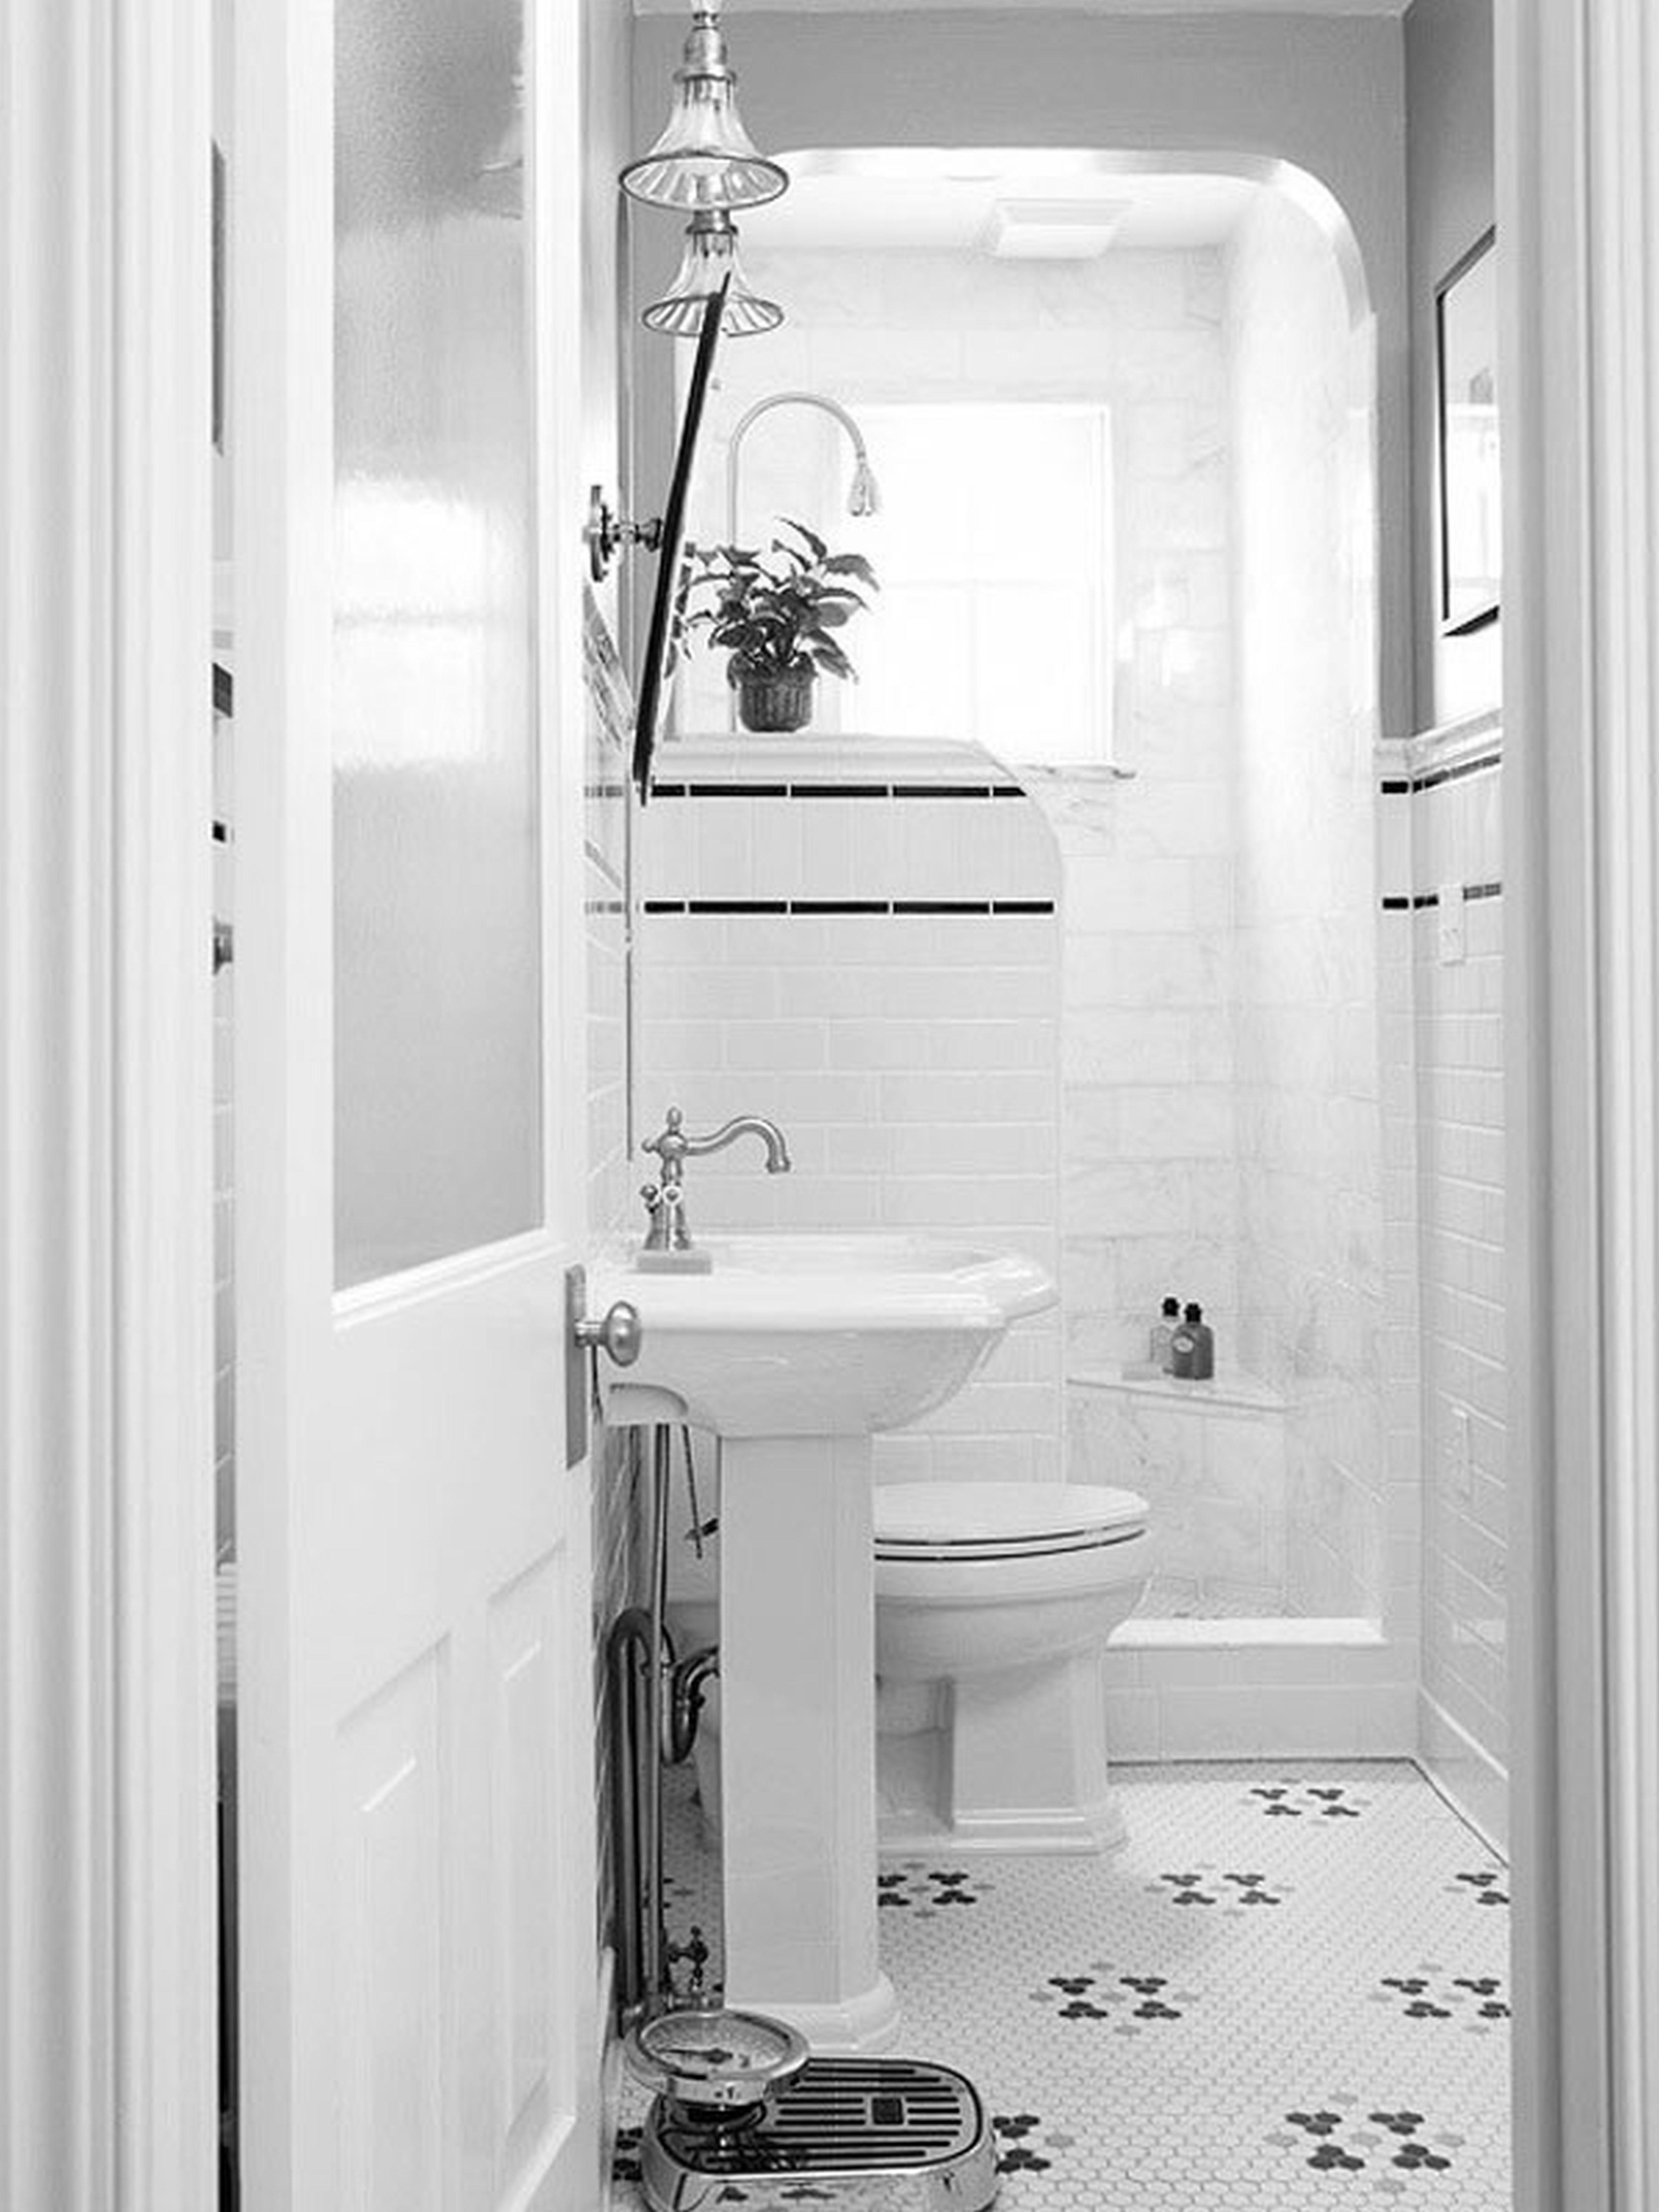 5 x 6 bathroom pictures google search - Bathroom Designs In Mumbai